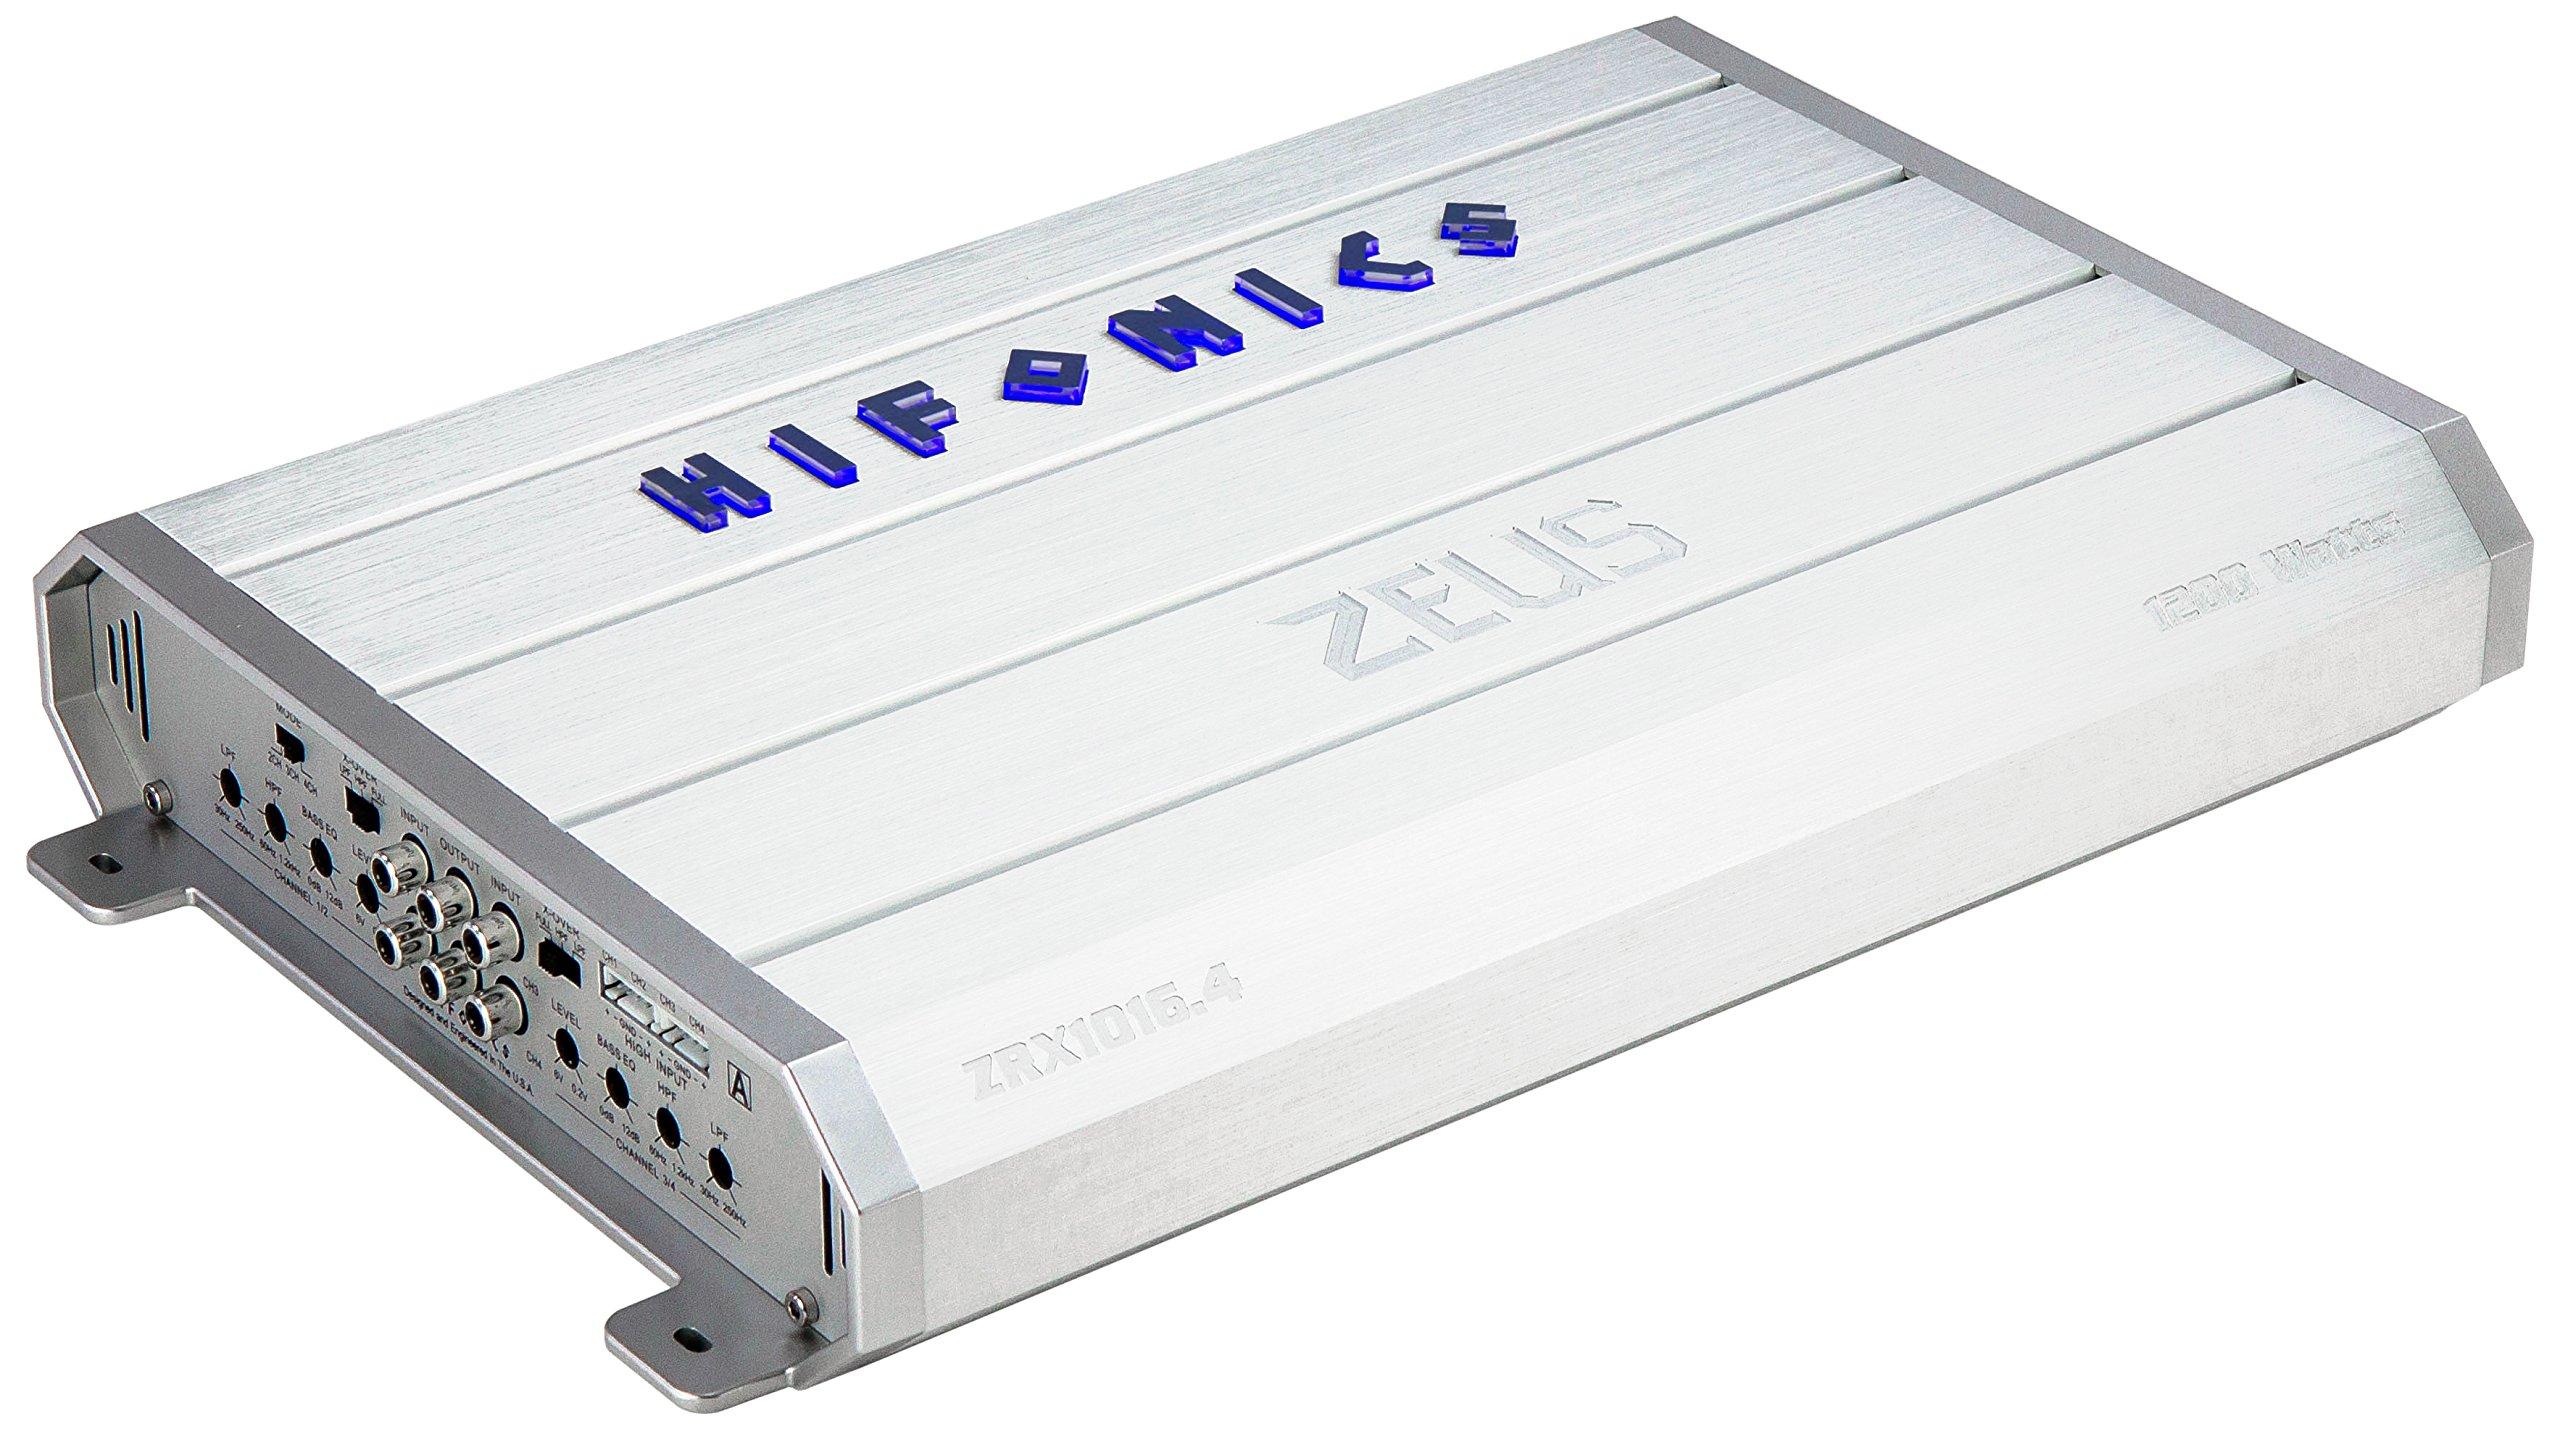 Hifonics ZRX1016.4 Zeus Car Audio Amplifier, 4-Channel 1000-Watt by Hifonics